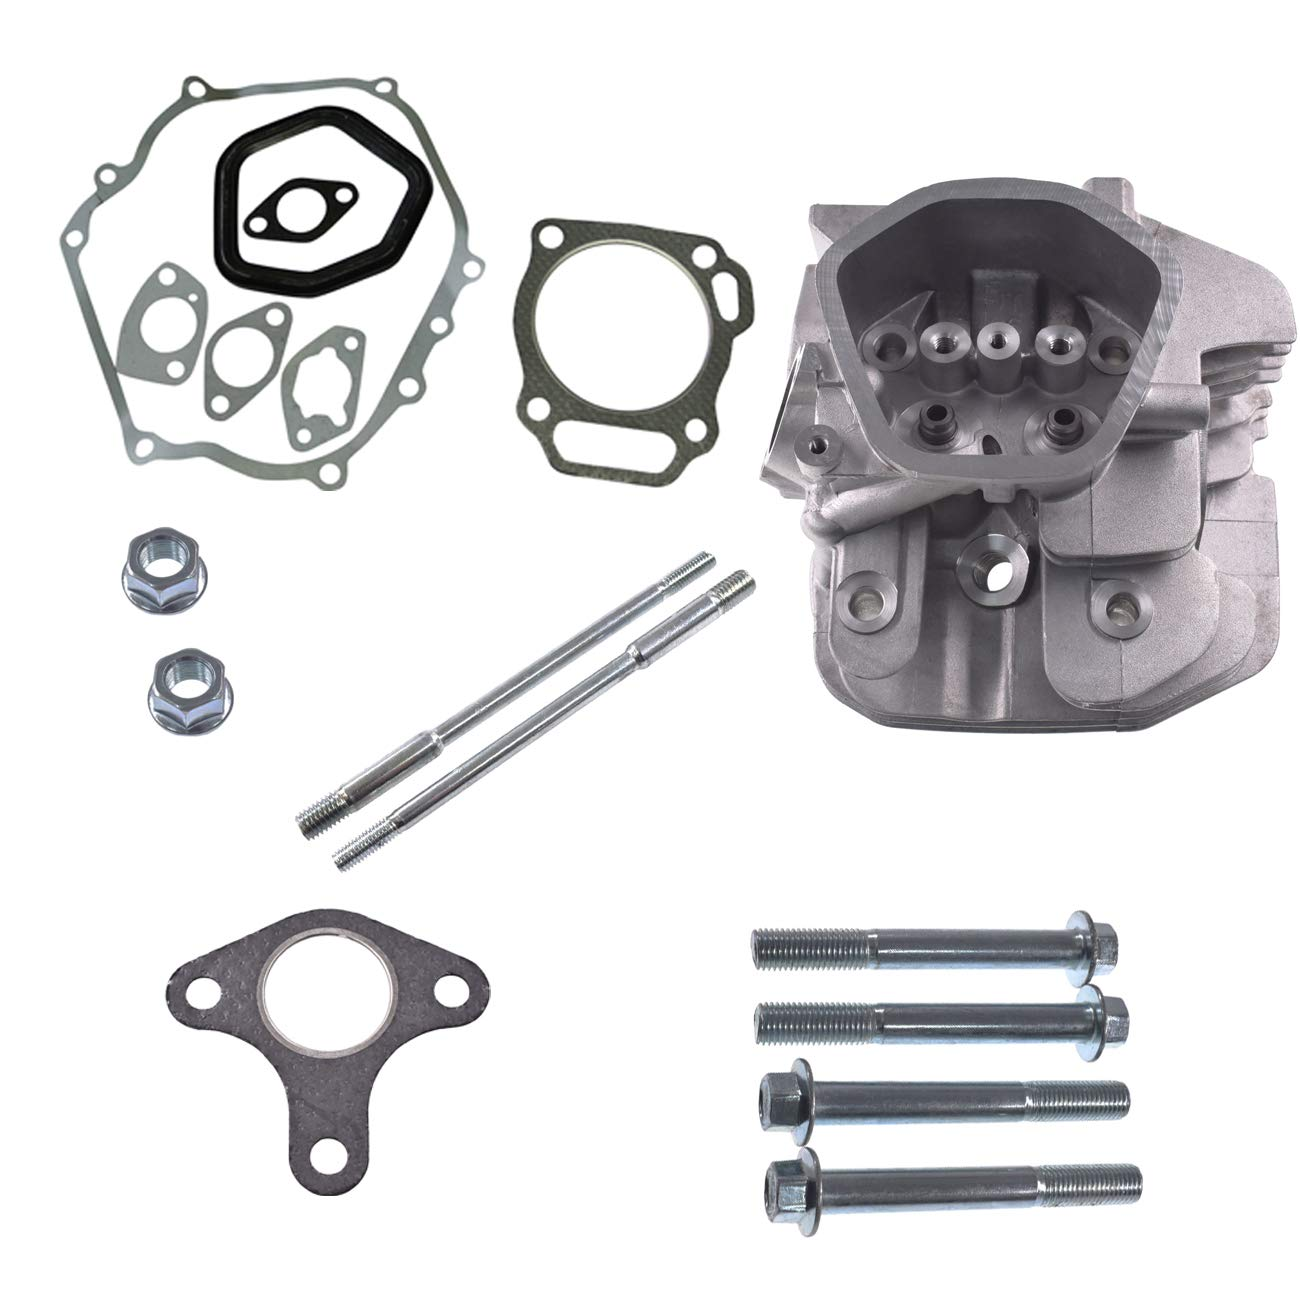 JRL Cylinder Head with Gaket Bolt Carb Bolt Nut Fits Honda GX390 Engine